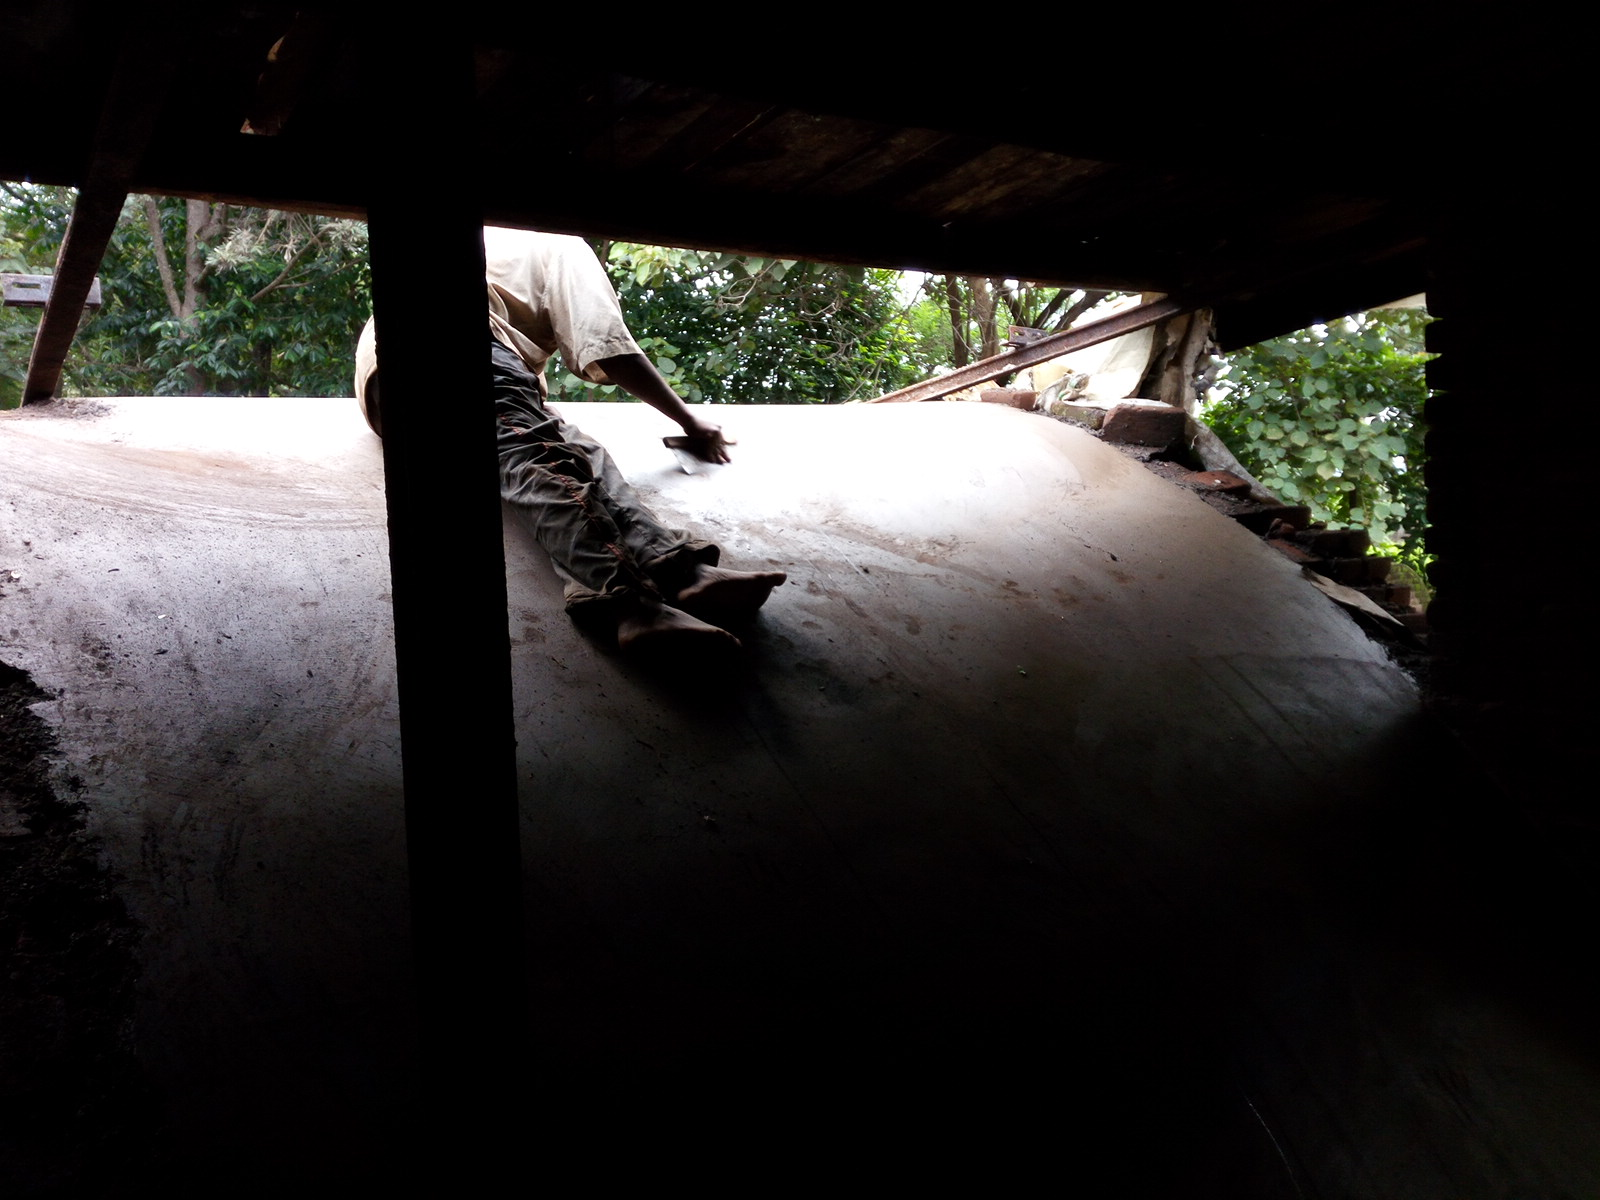 Clamp kiln vault and chimney-img_20160504_092627_1cs.jpg